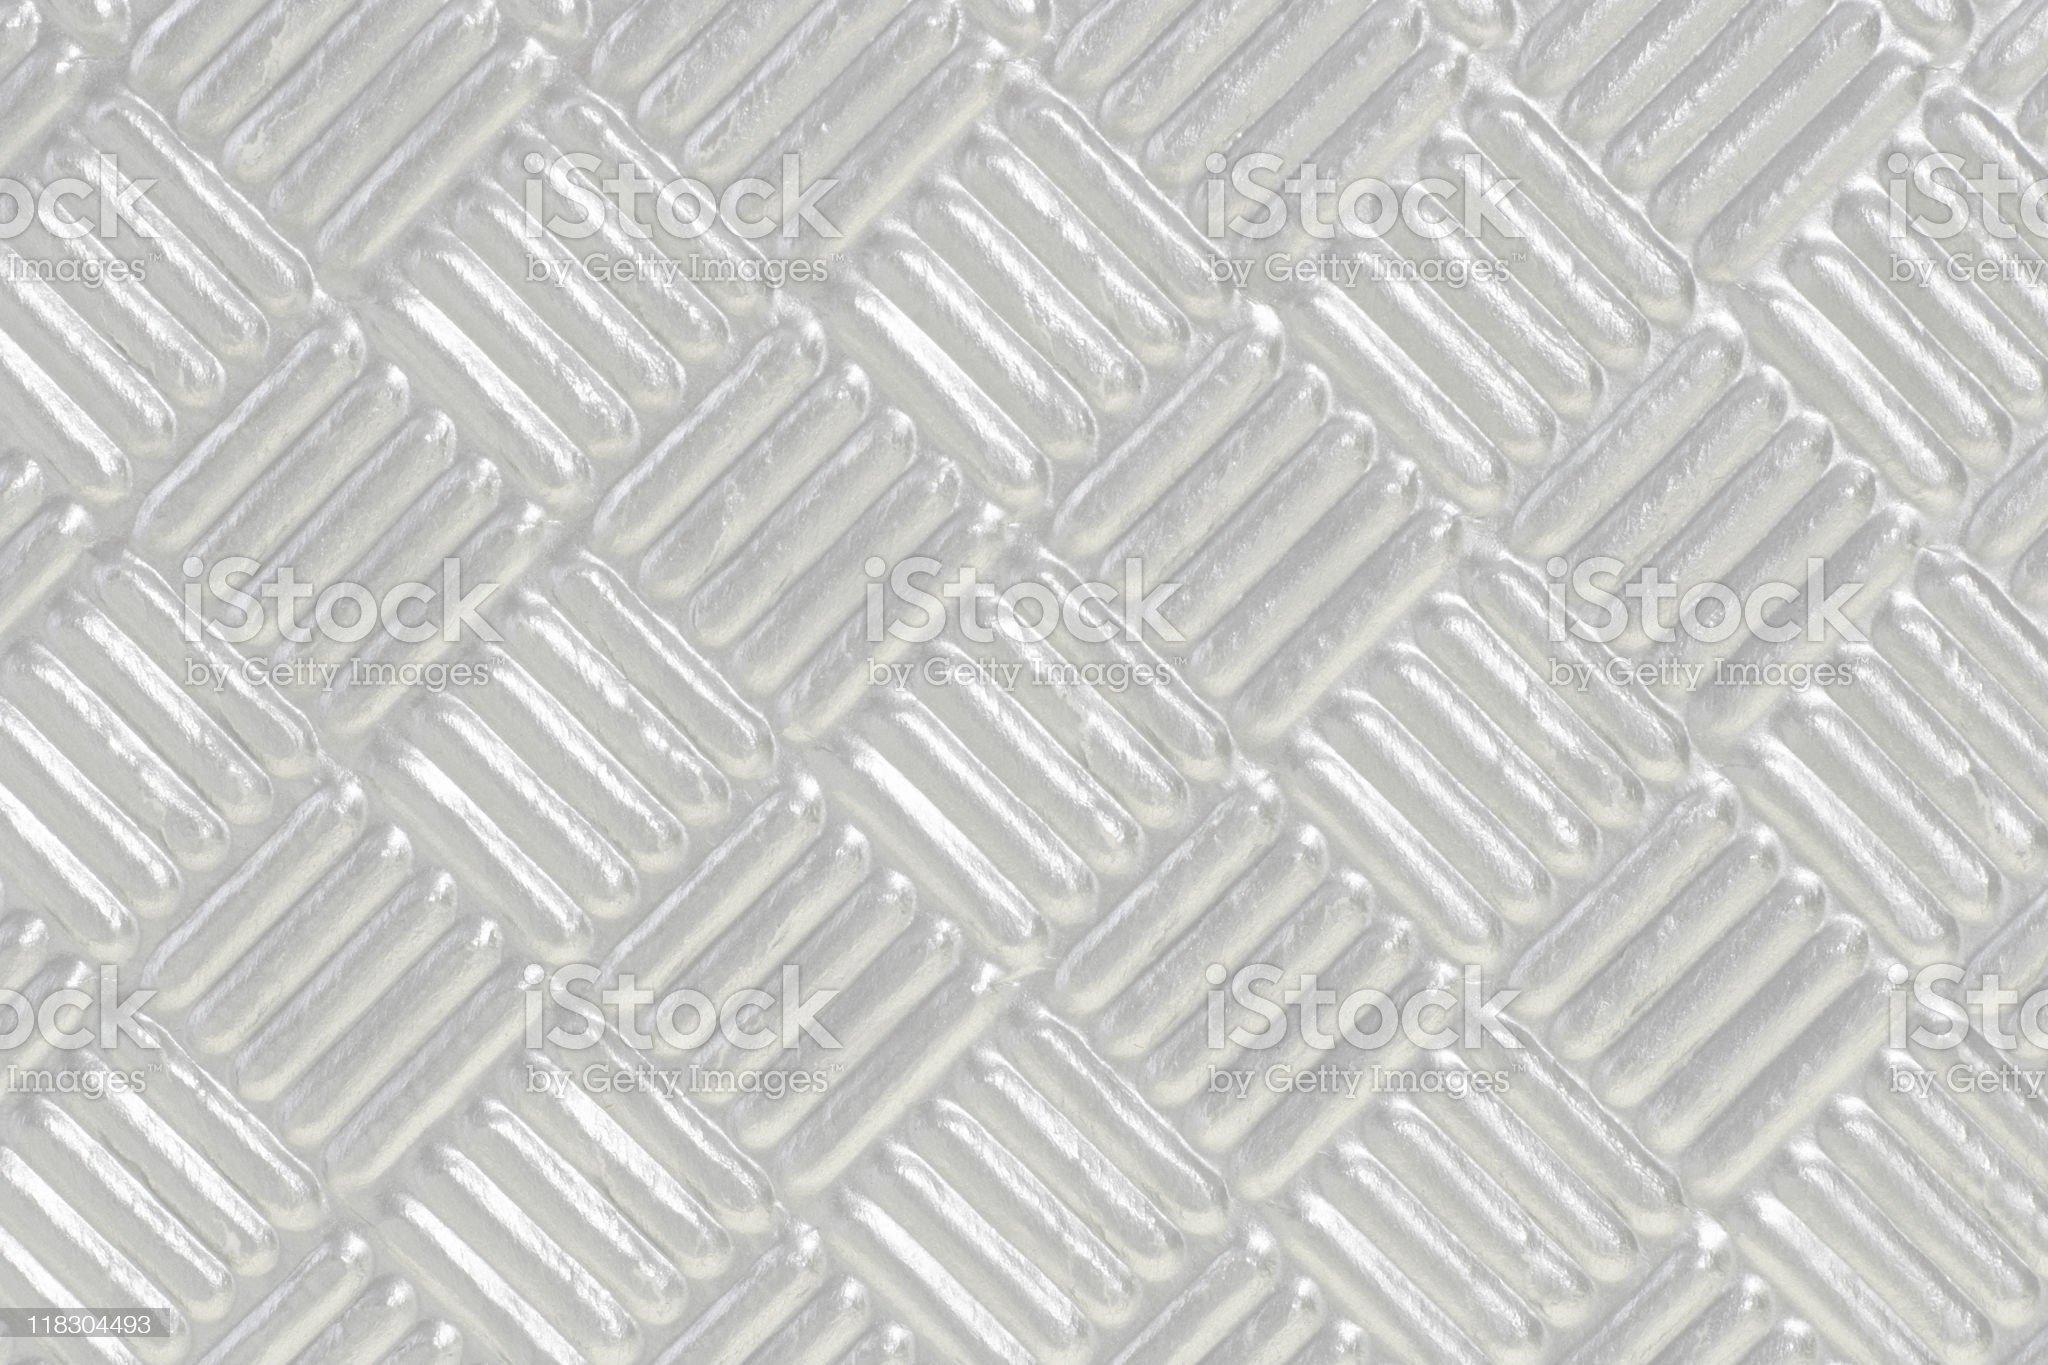 silver metallic pattern background royalty-free stock photo